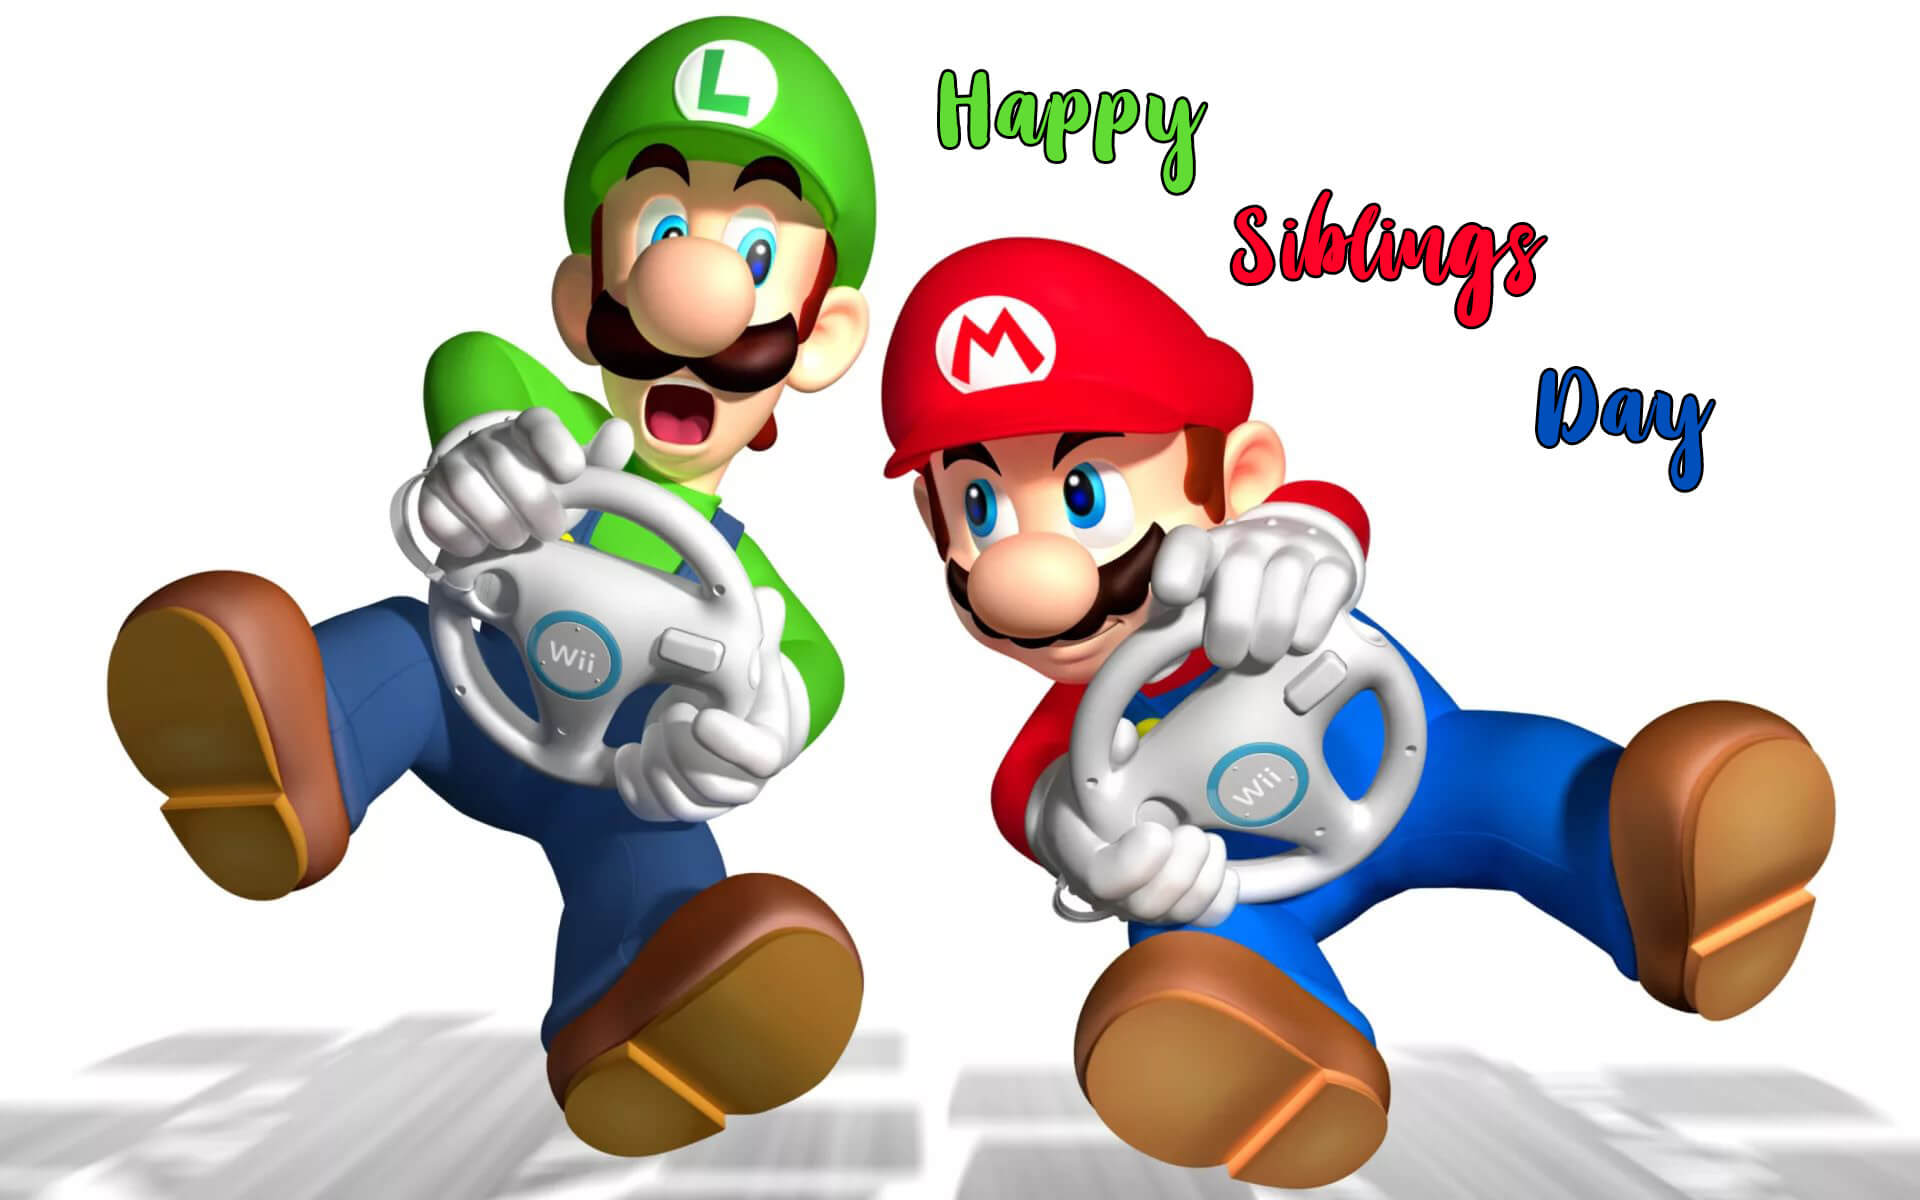 happy national siblings day mario luigi brothers hd wallpaper